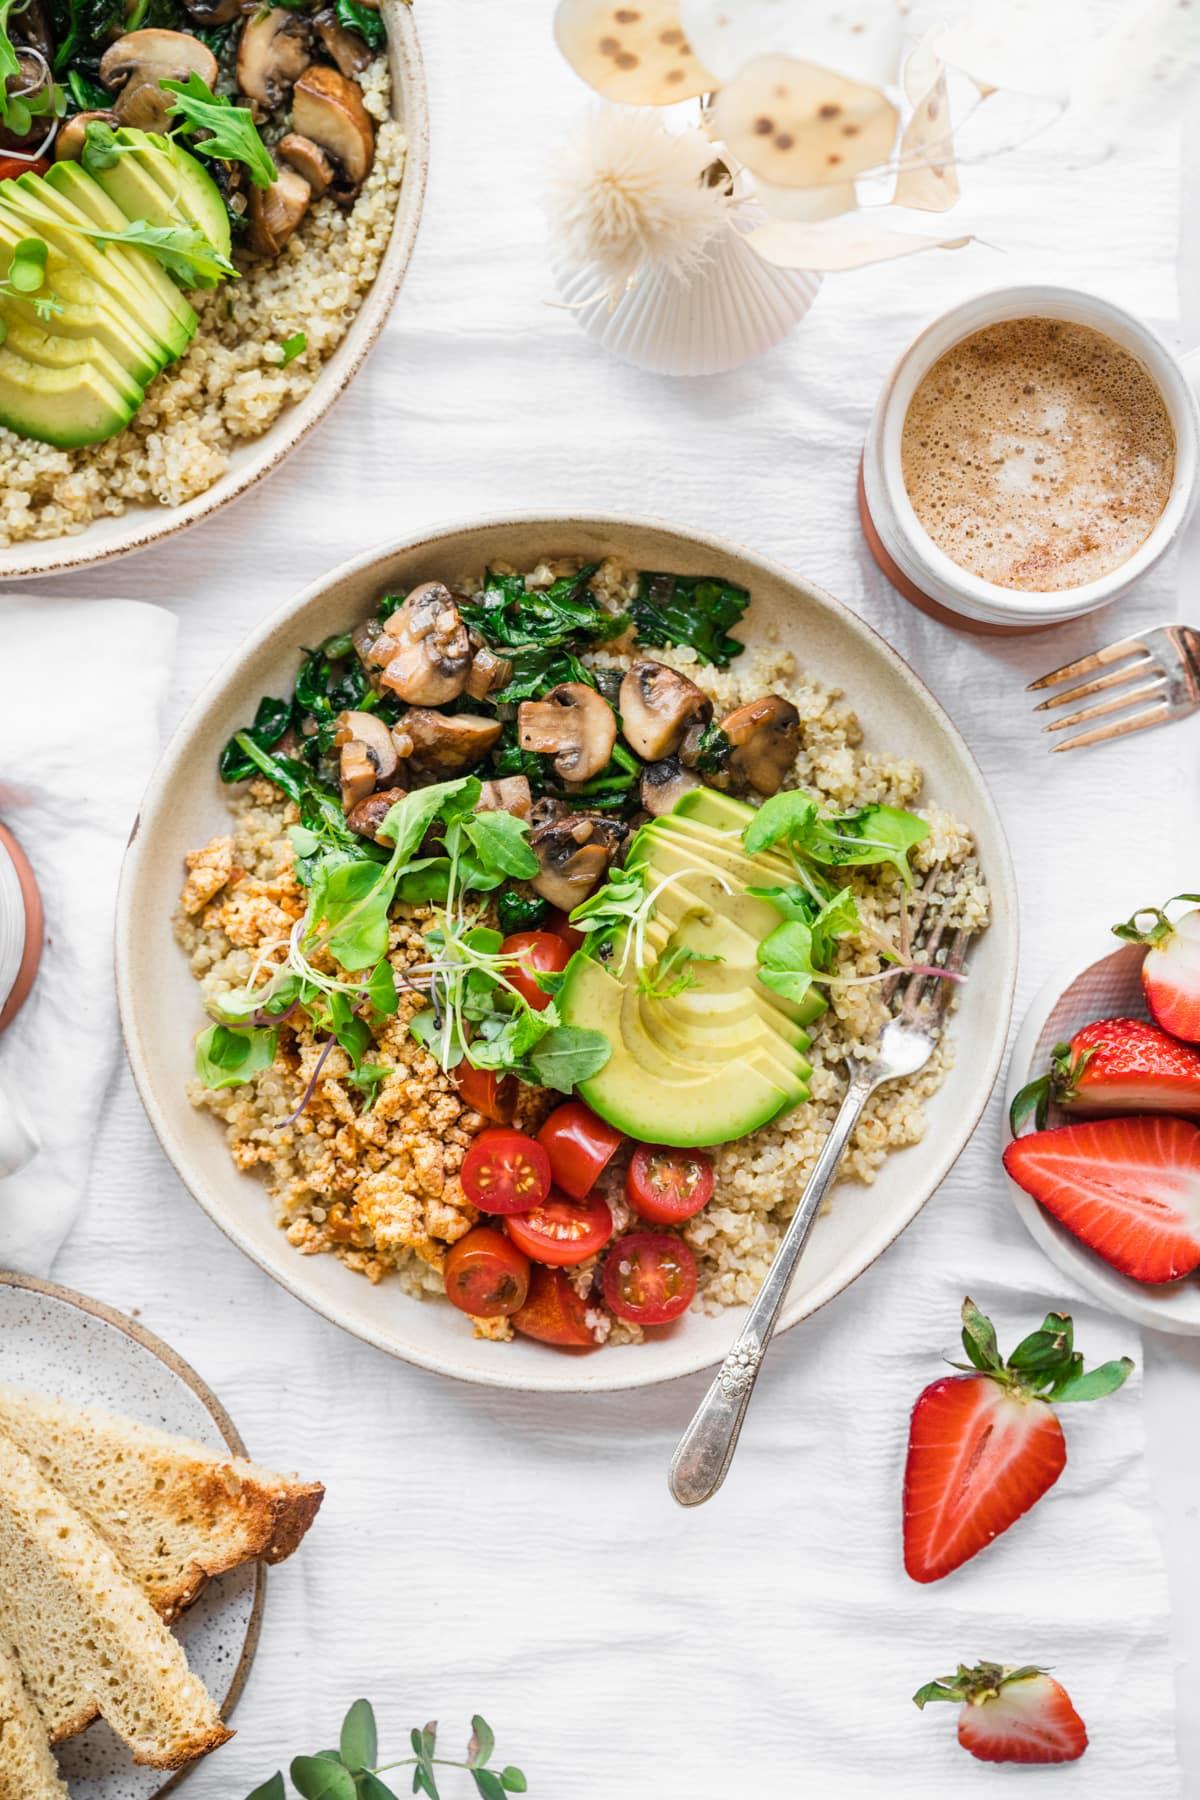 overhead view of vegan savory quinoa breakfast bowl with tofu, avocado and mushrooms.